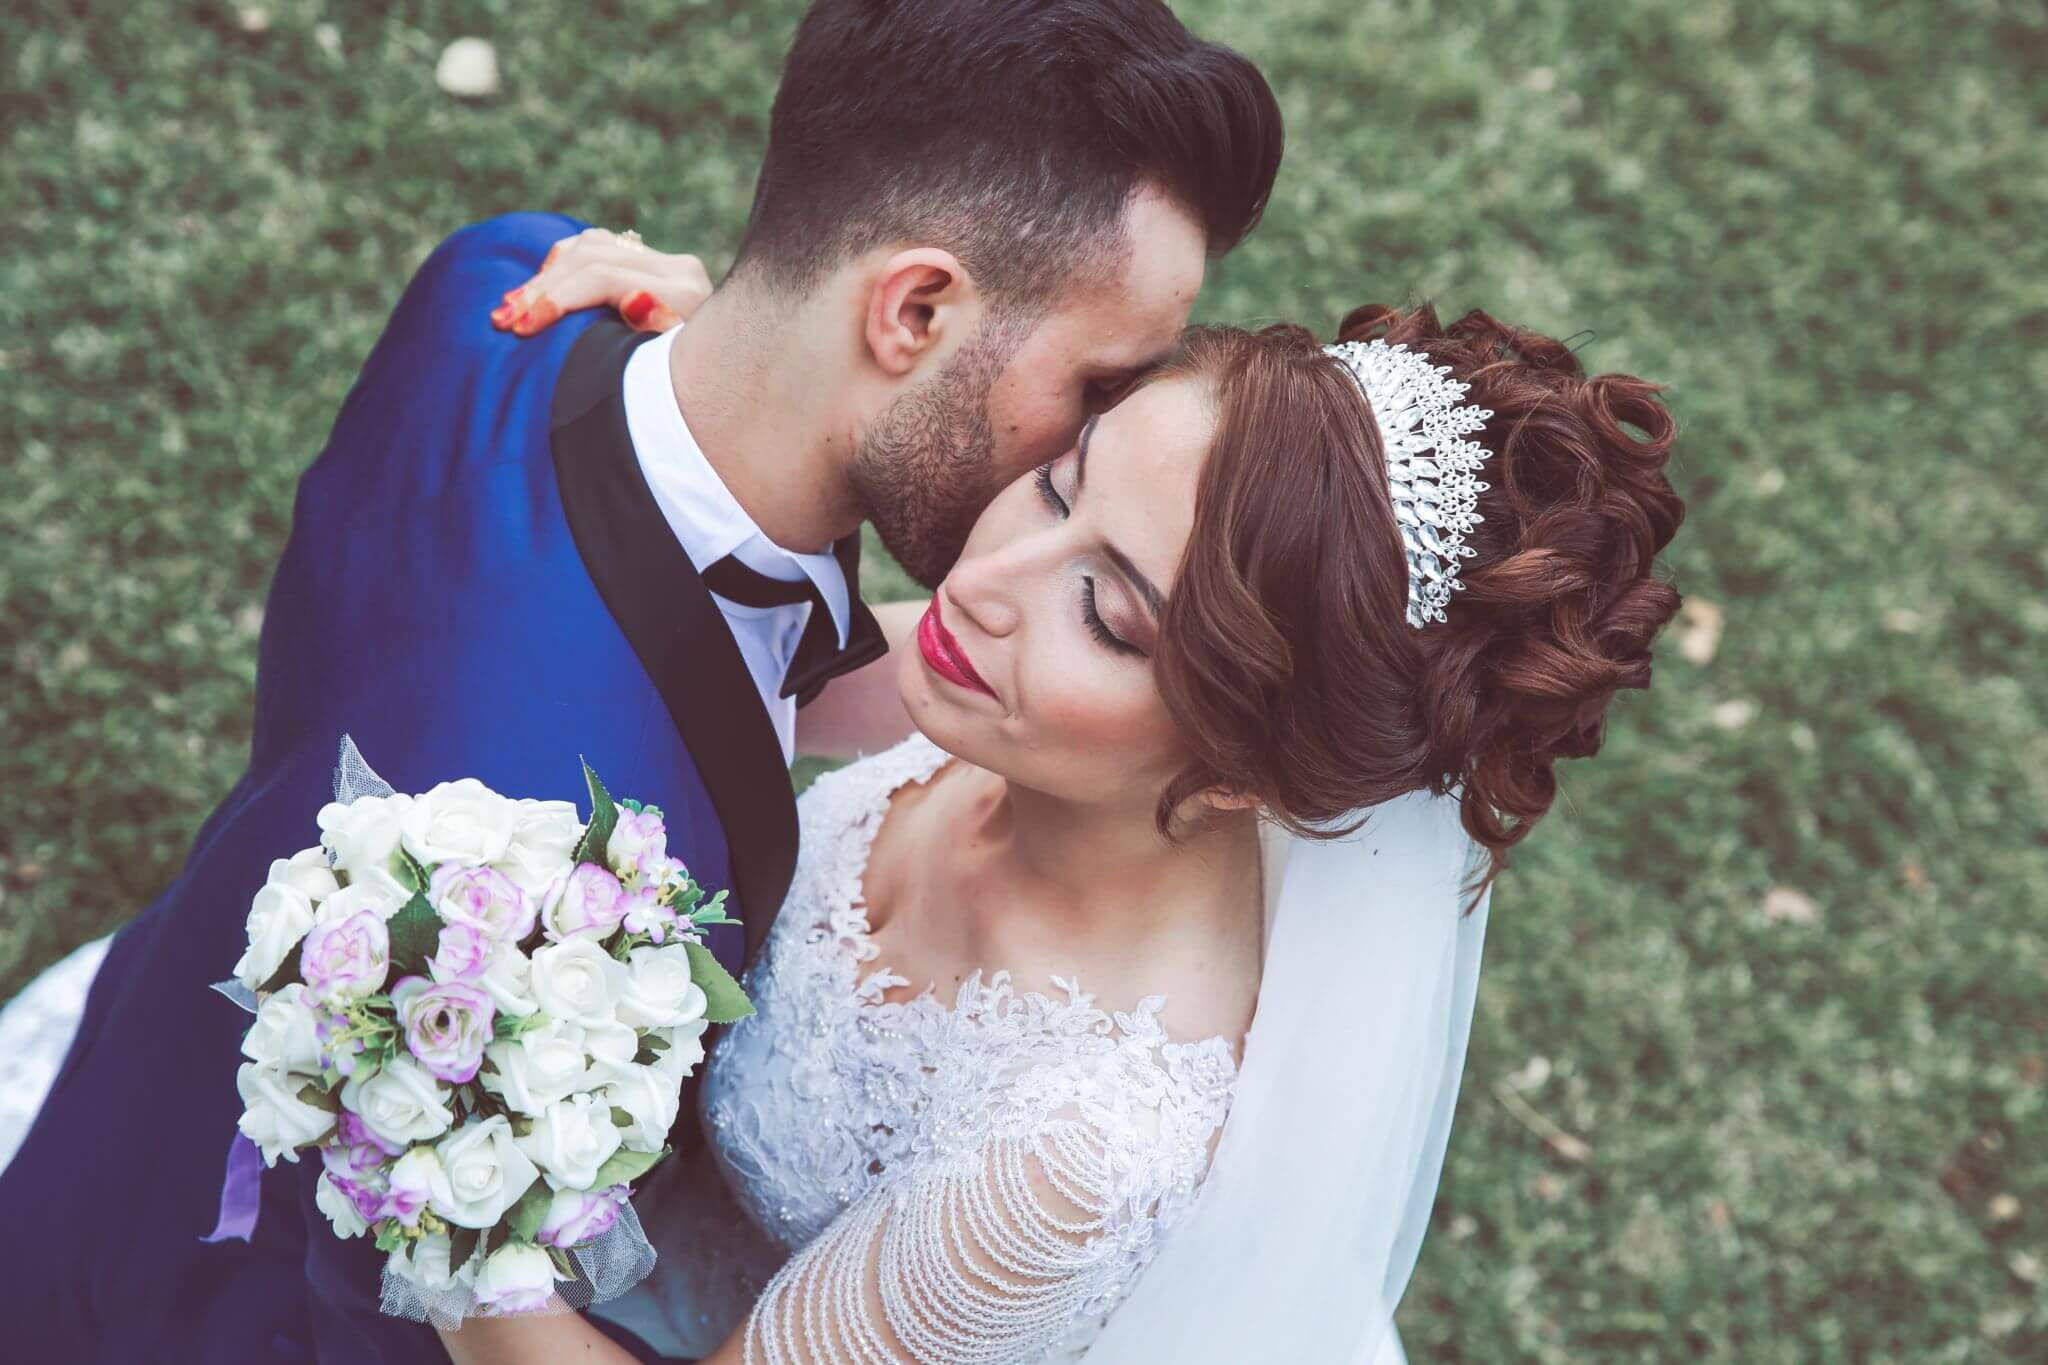 https://sleeklens.com/wp-content/uploads/2020/03/Just-Married-After.jpg